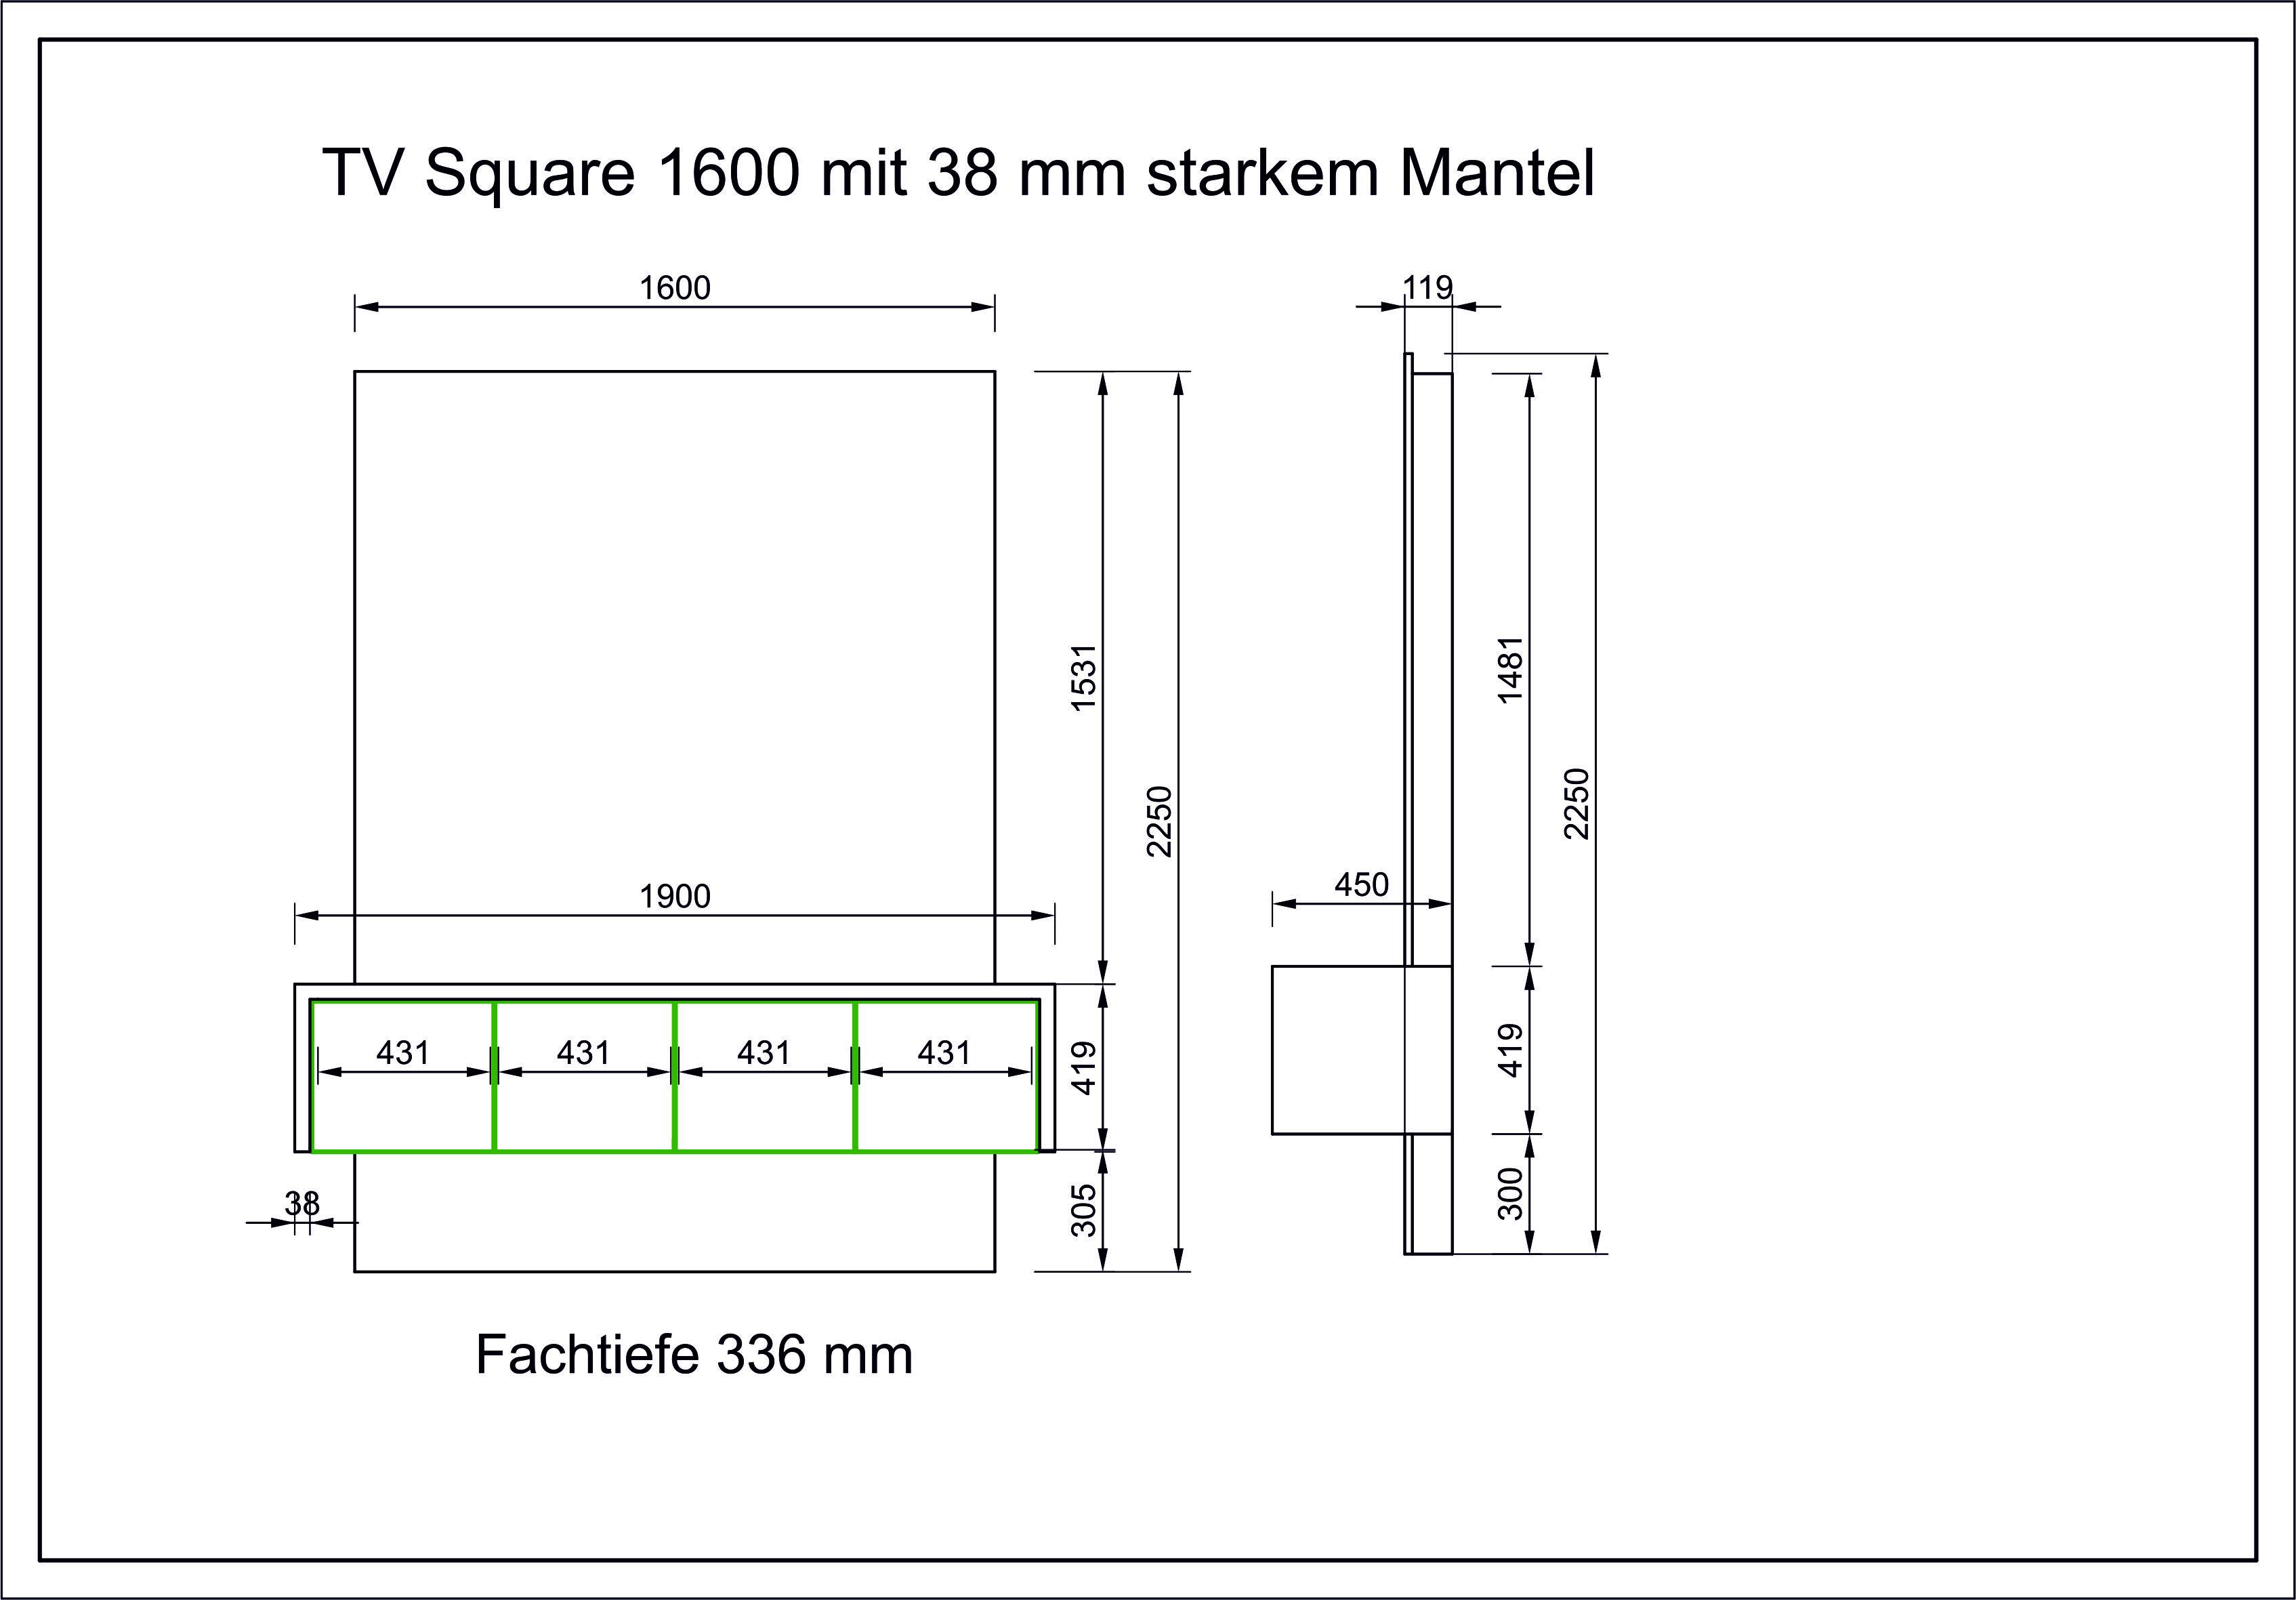 TV-Square-1600mm-mit-38mm-Mantel